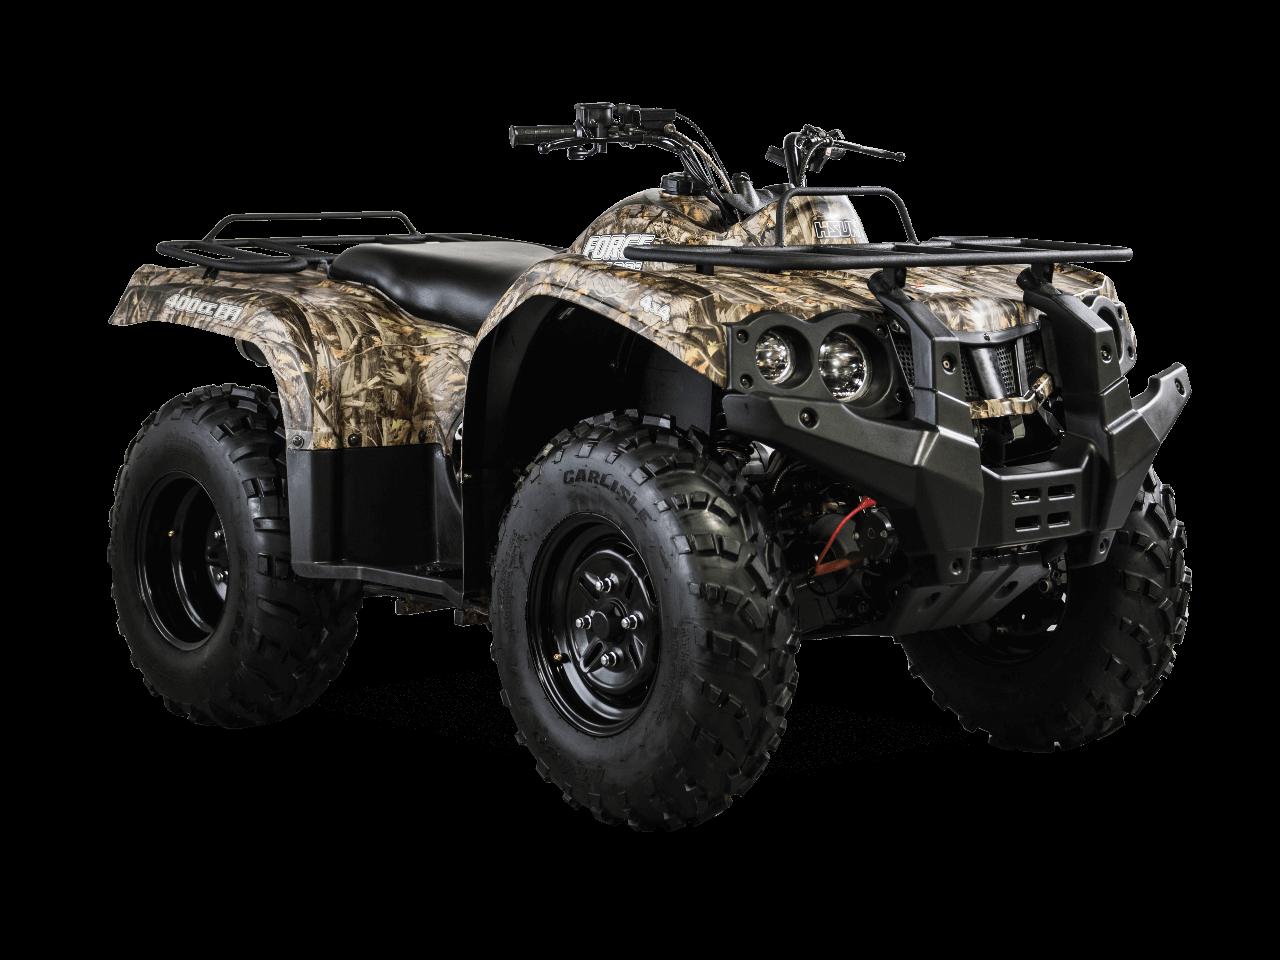 Southern Ontario Rentals - ATV Daily Rental - 1 Rider per Machine